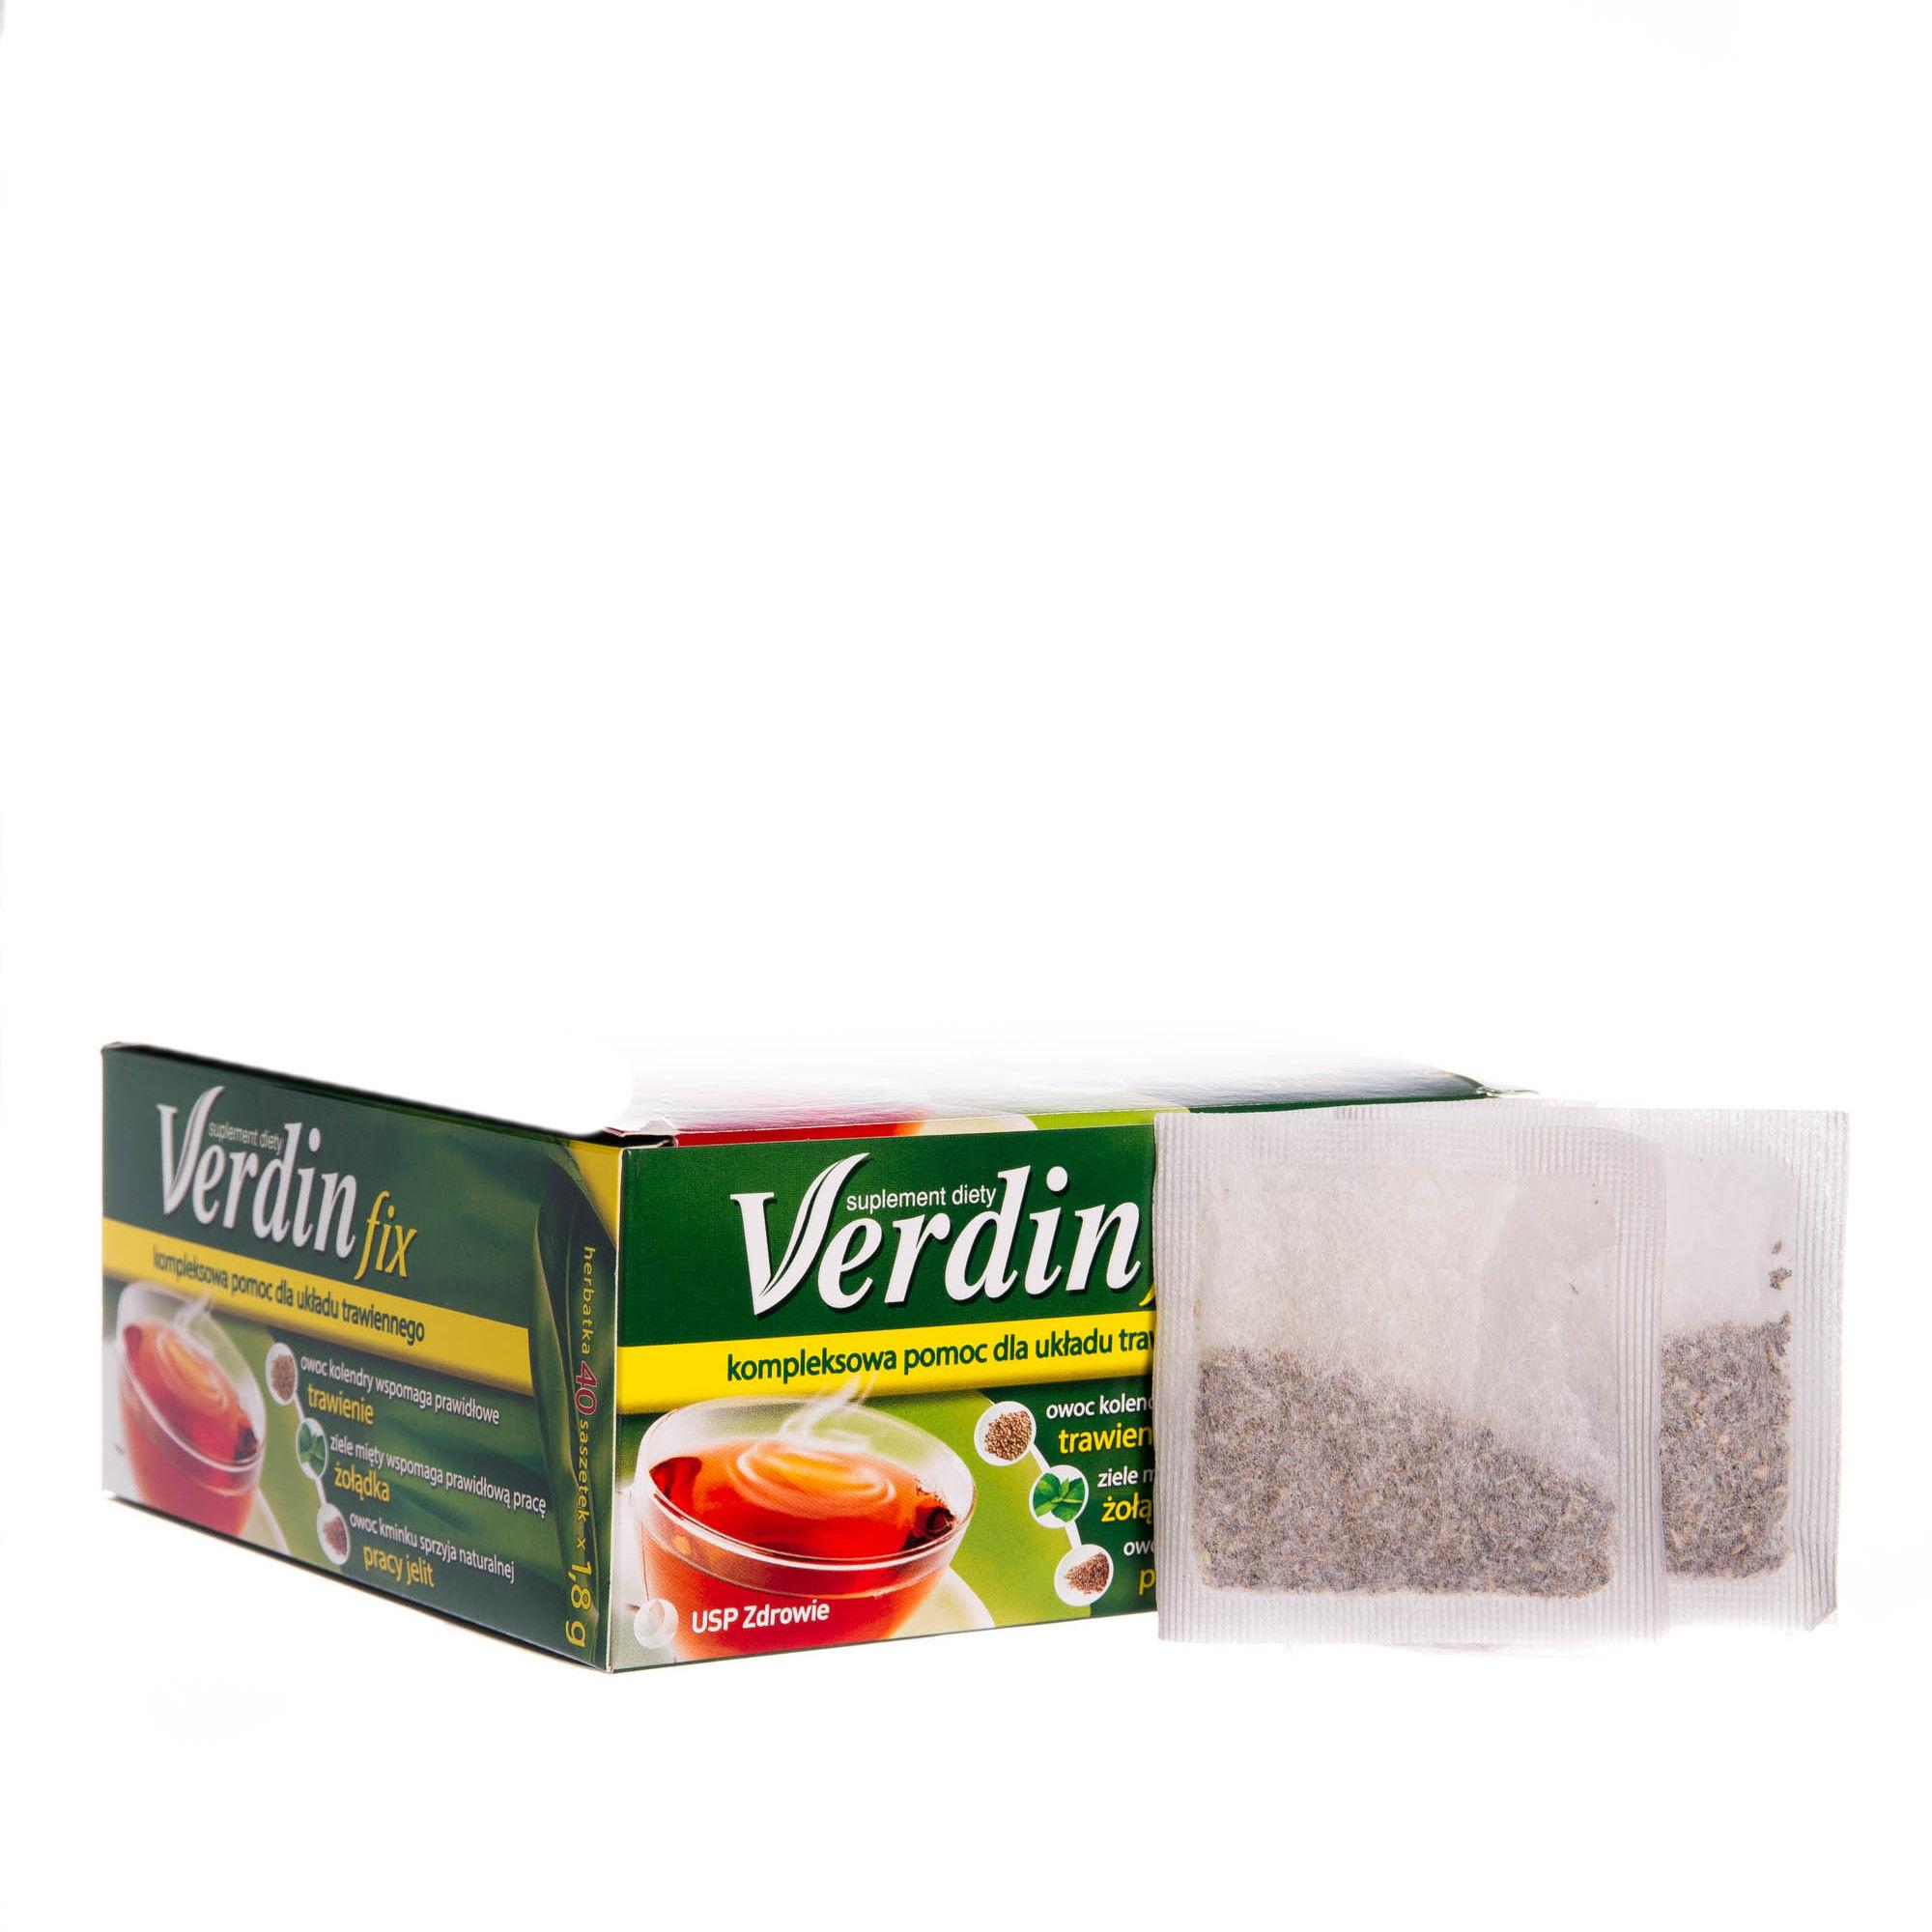 Verdin Fix Suplement diety kompozycja 6 ziół 40sasz.